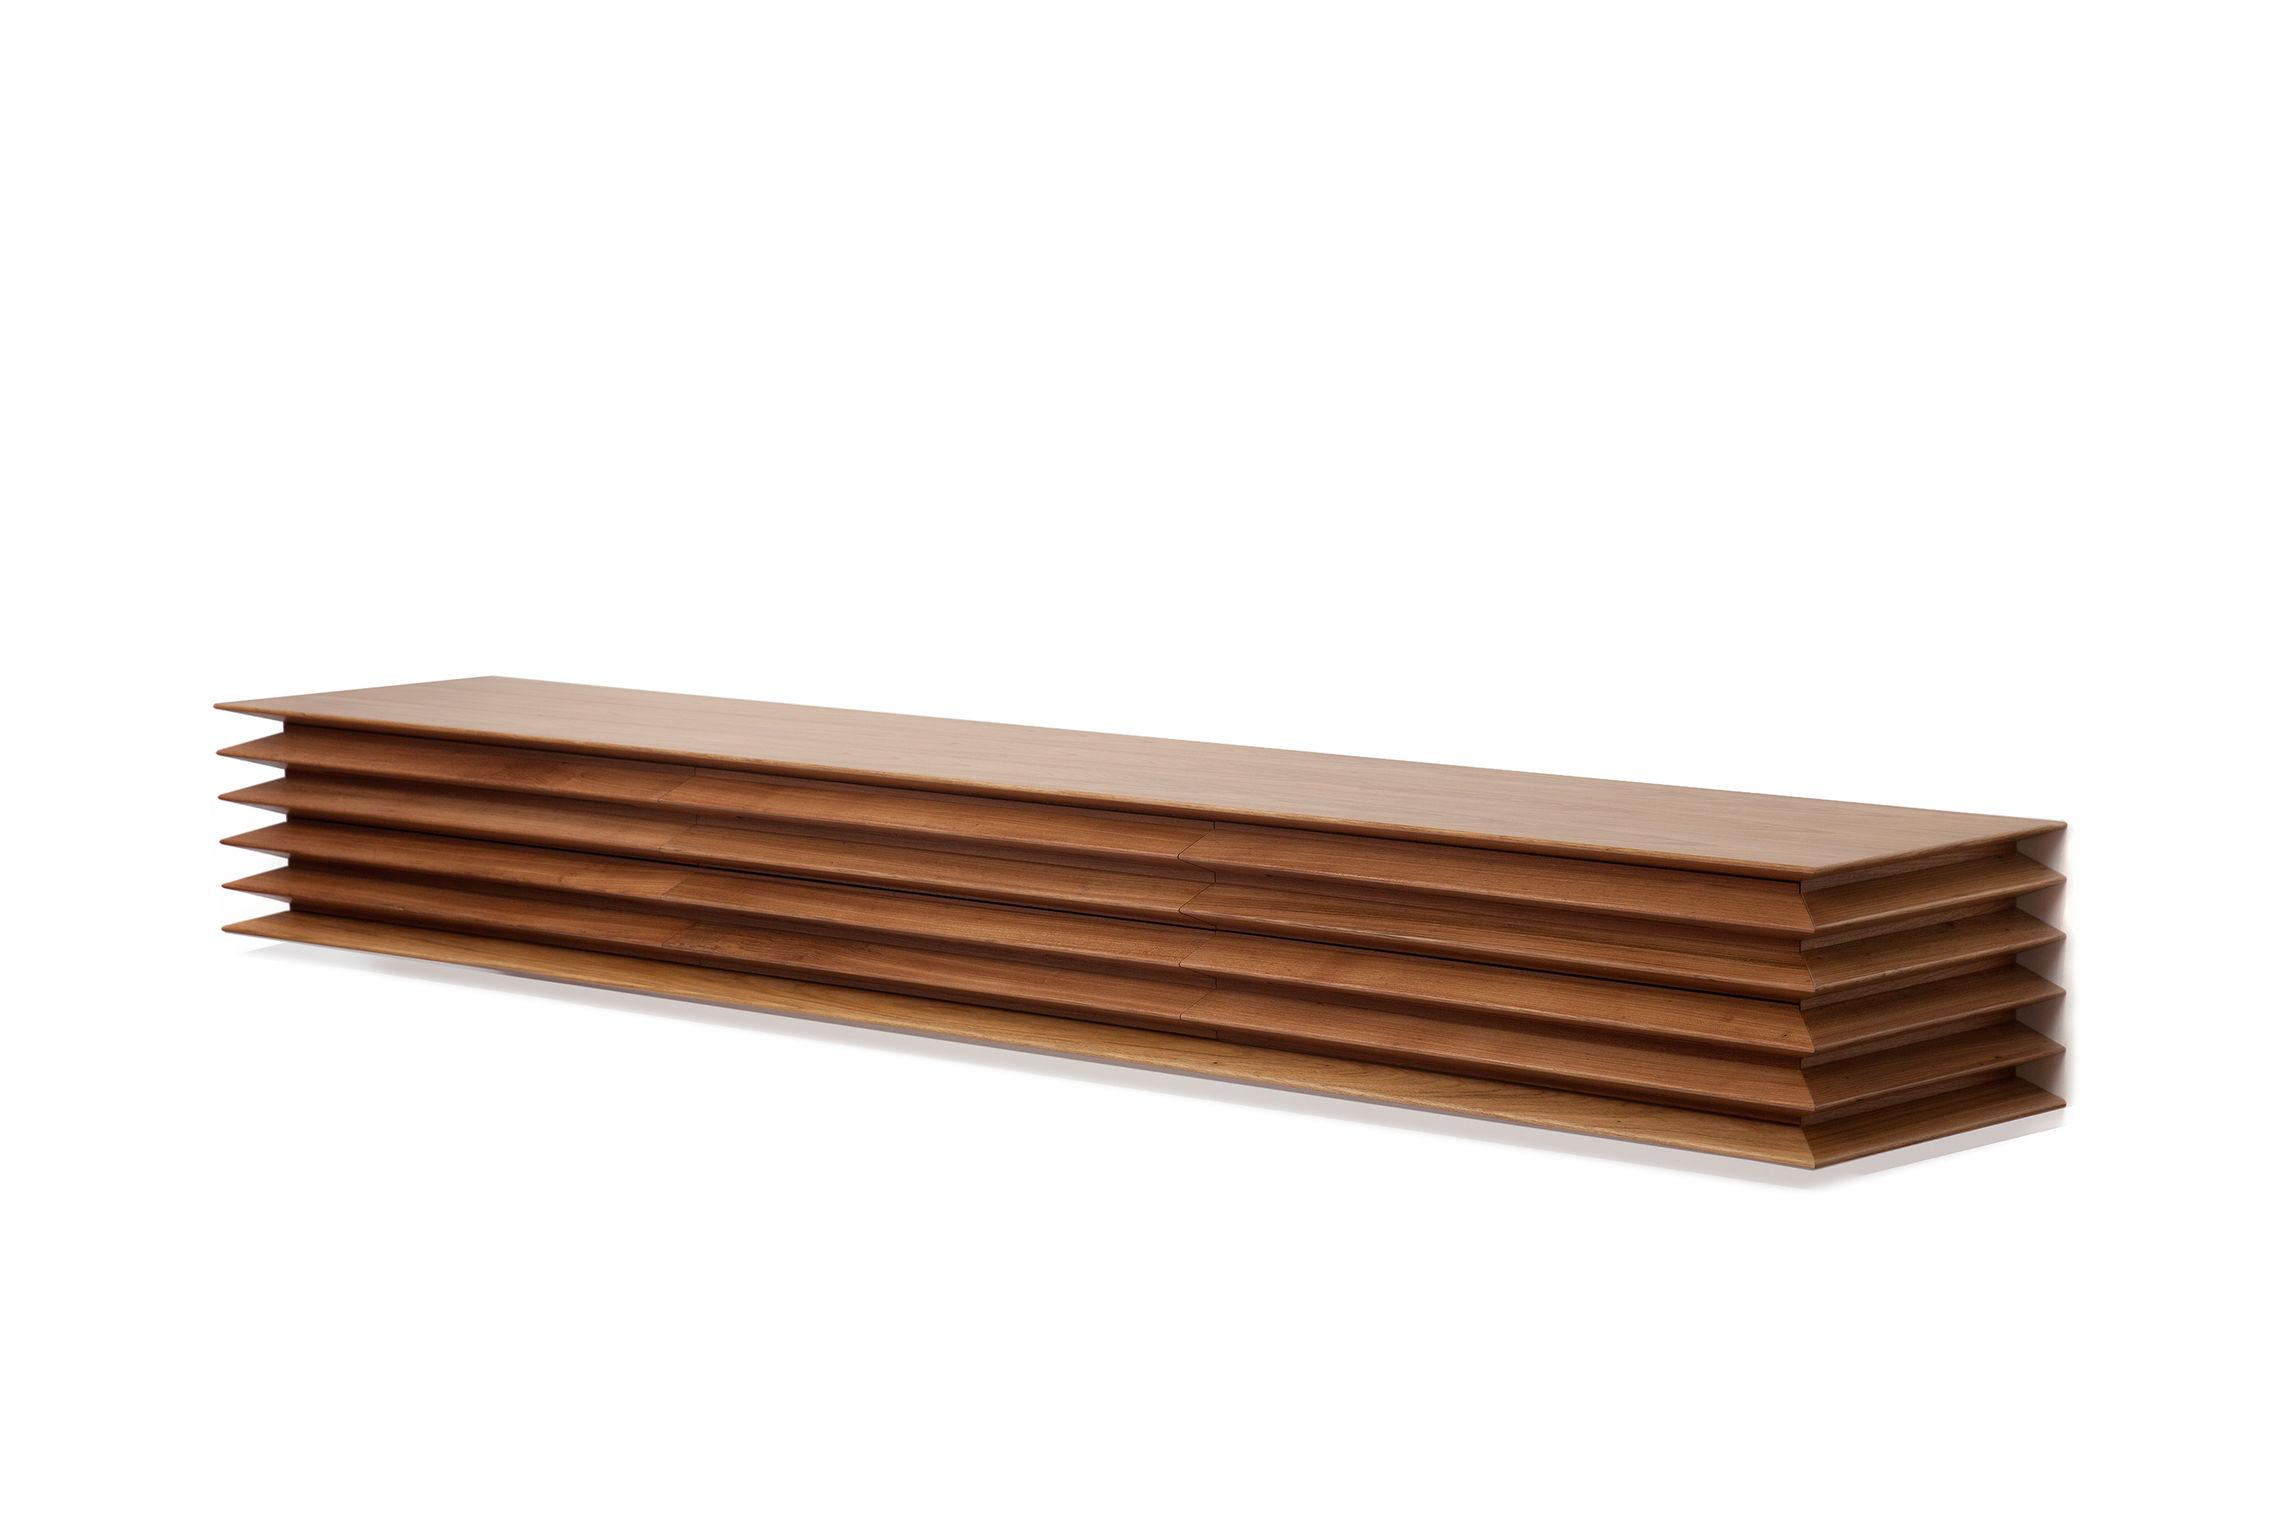 Horizon Sideboard, da Etel, por Azul Arquitetura e Design